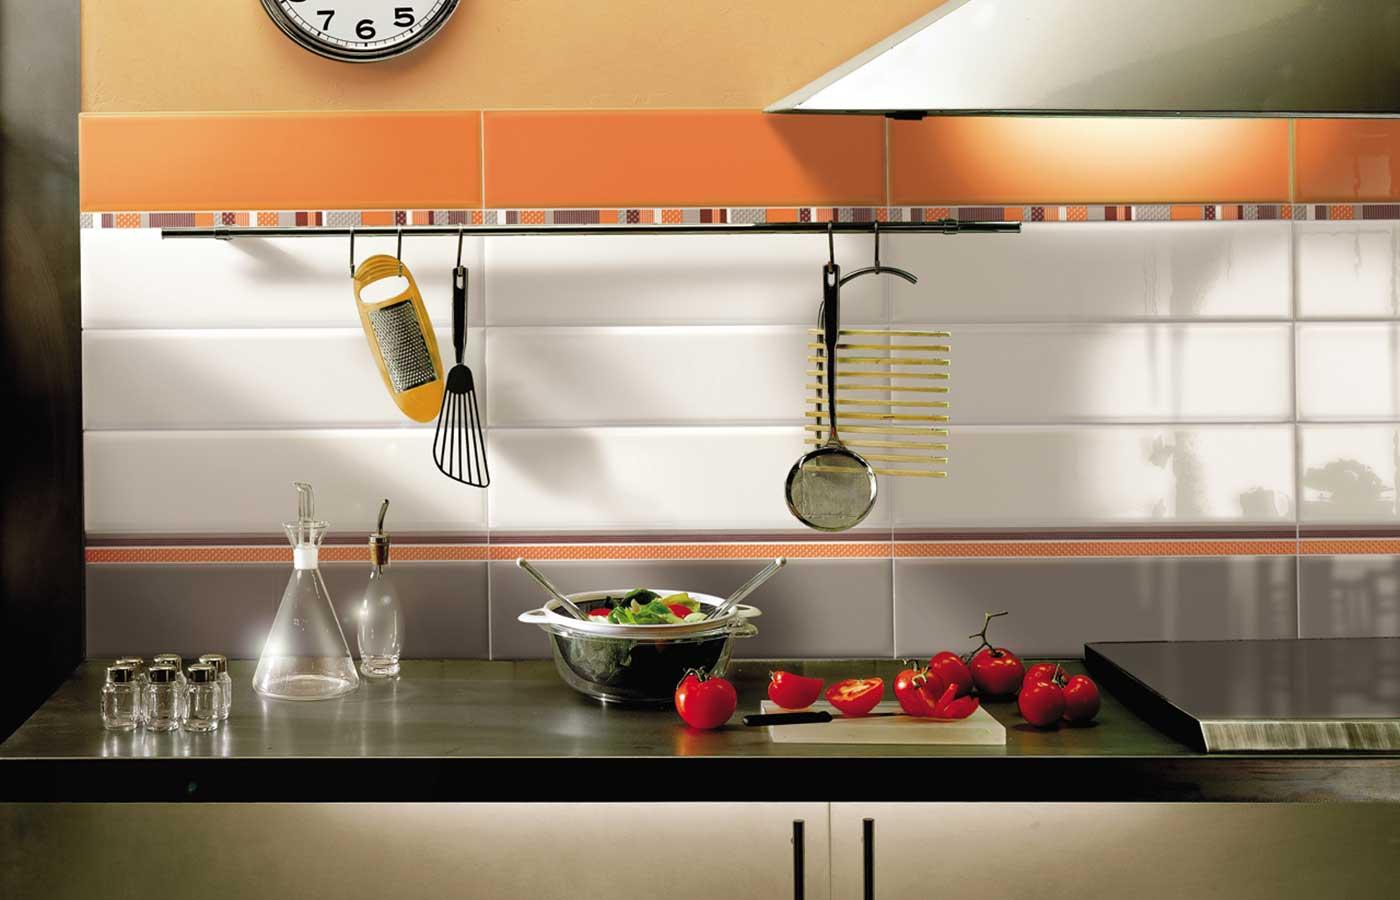 FLAIR: Arancio - Bianco - Grigio - Avorio